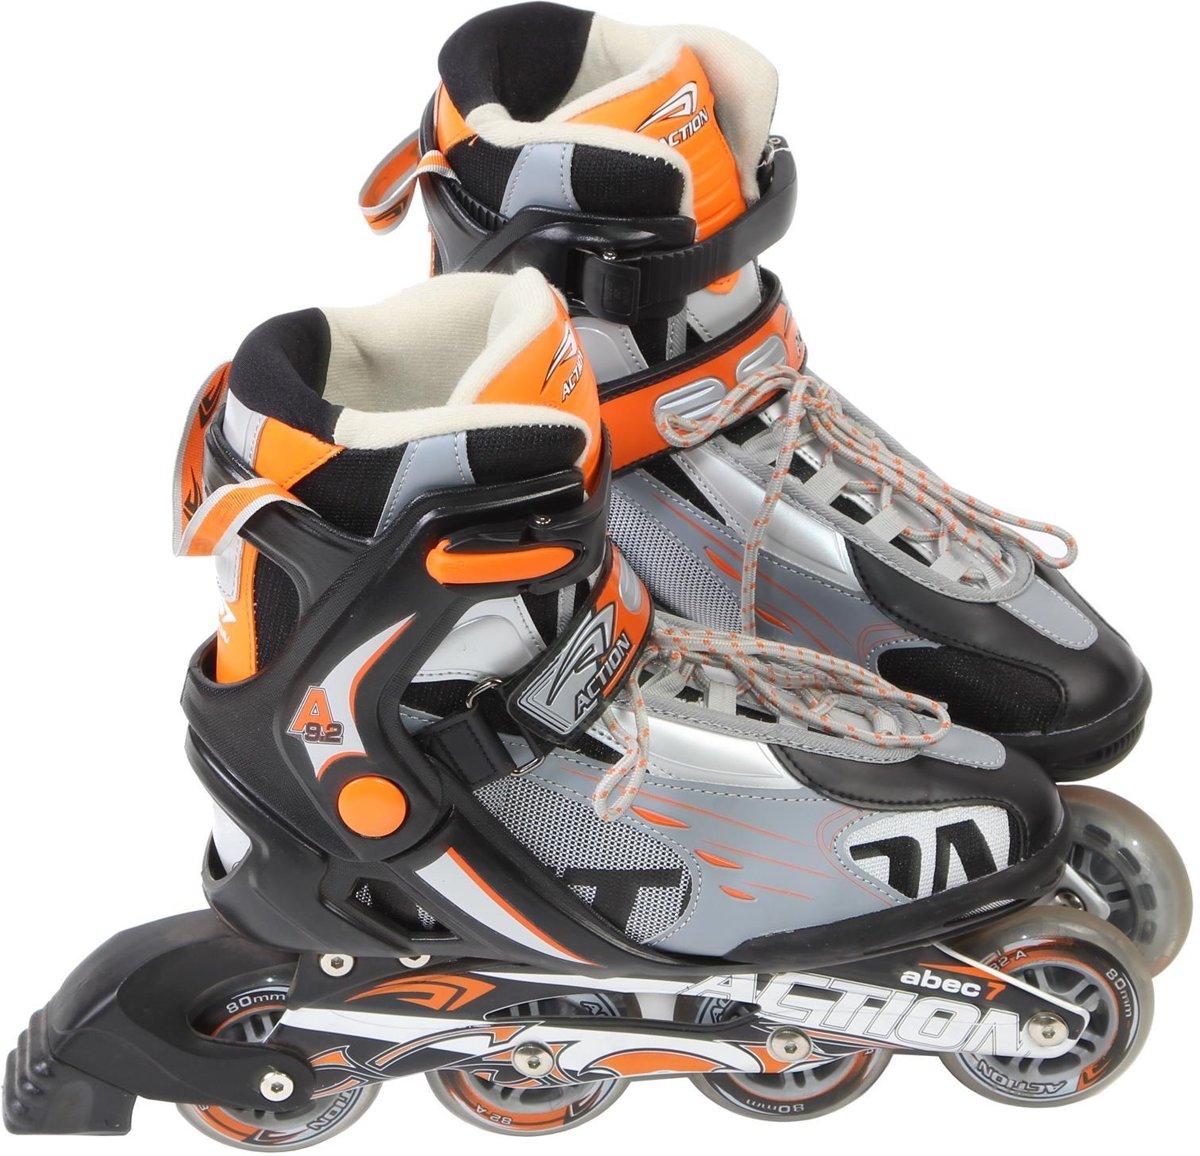 Laubr Speed Skates - maat 45 - ABEC 7 - oranje/zwart/grijs - alu frame kopen